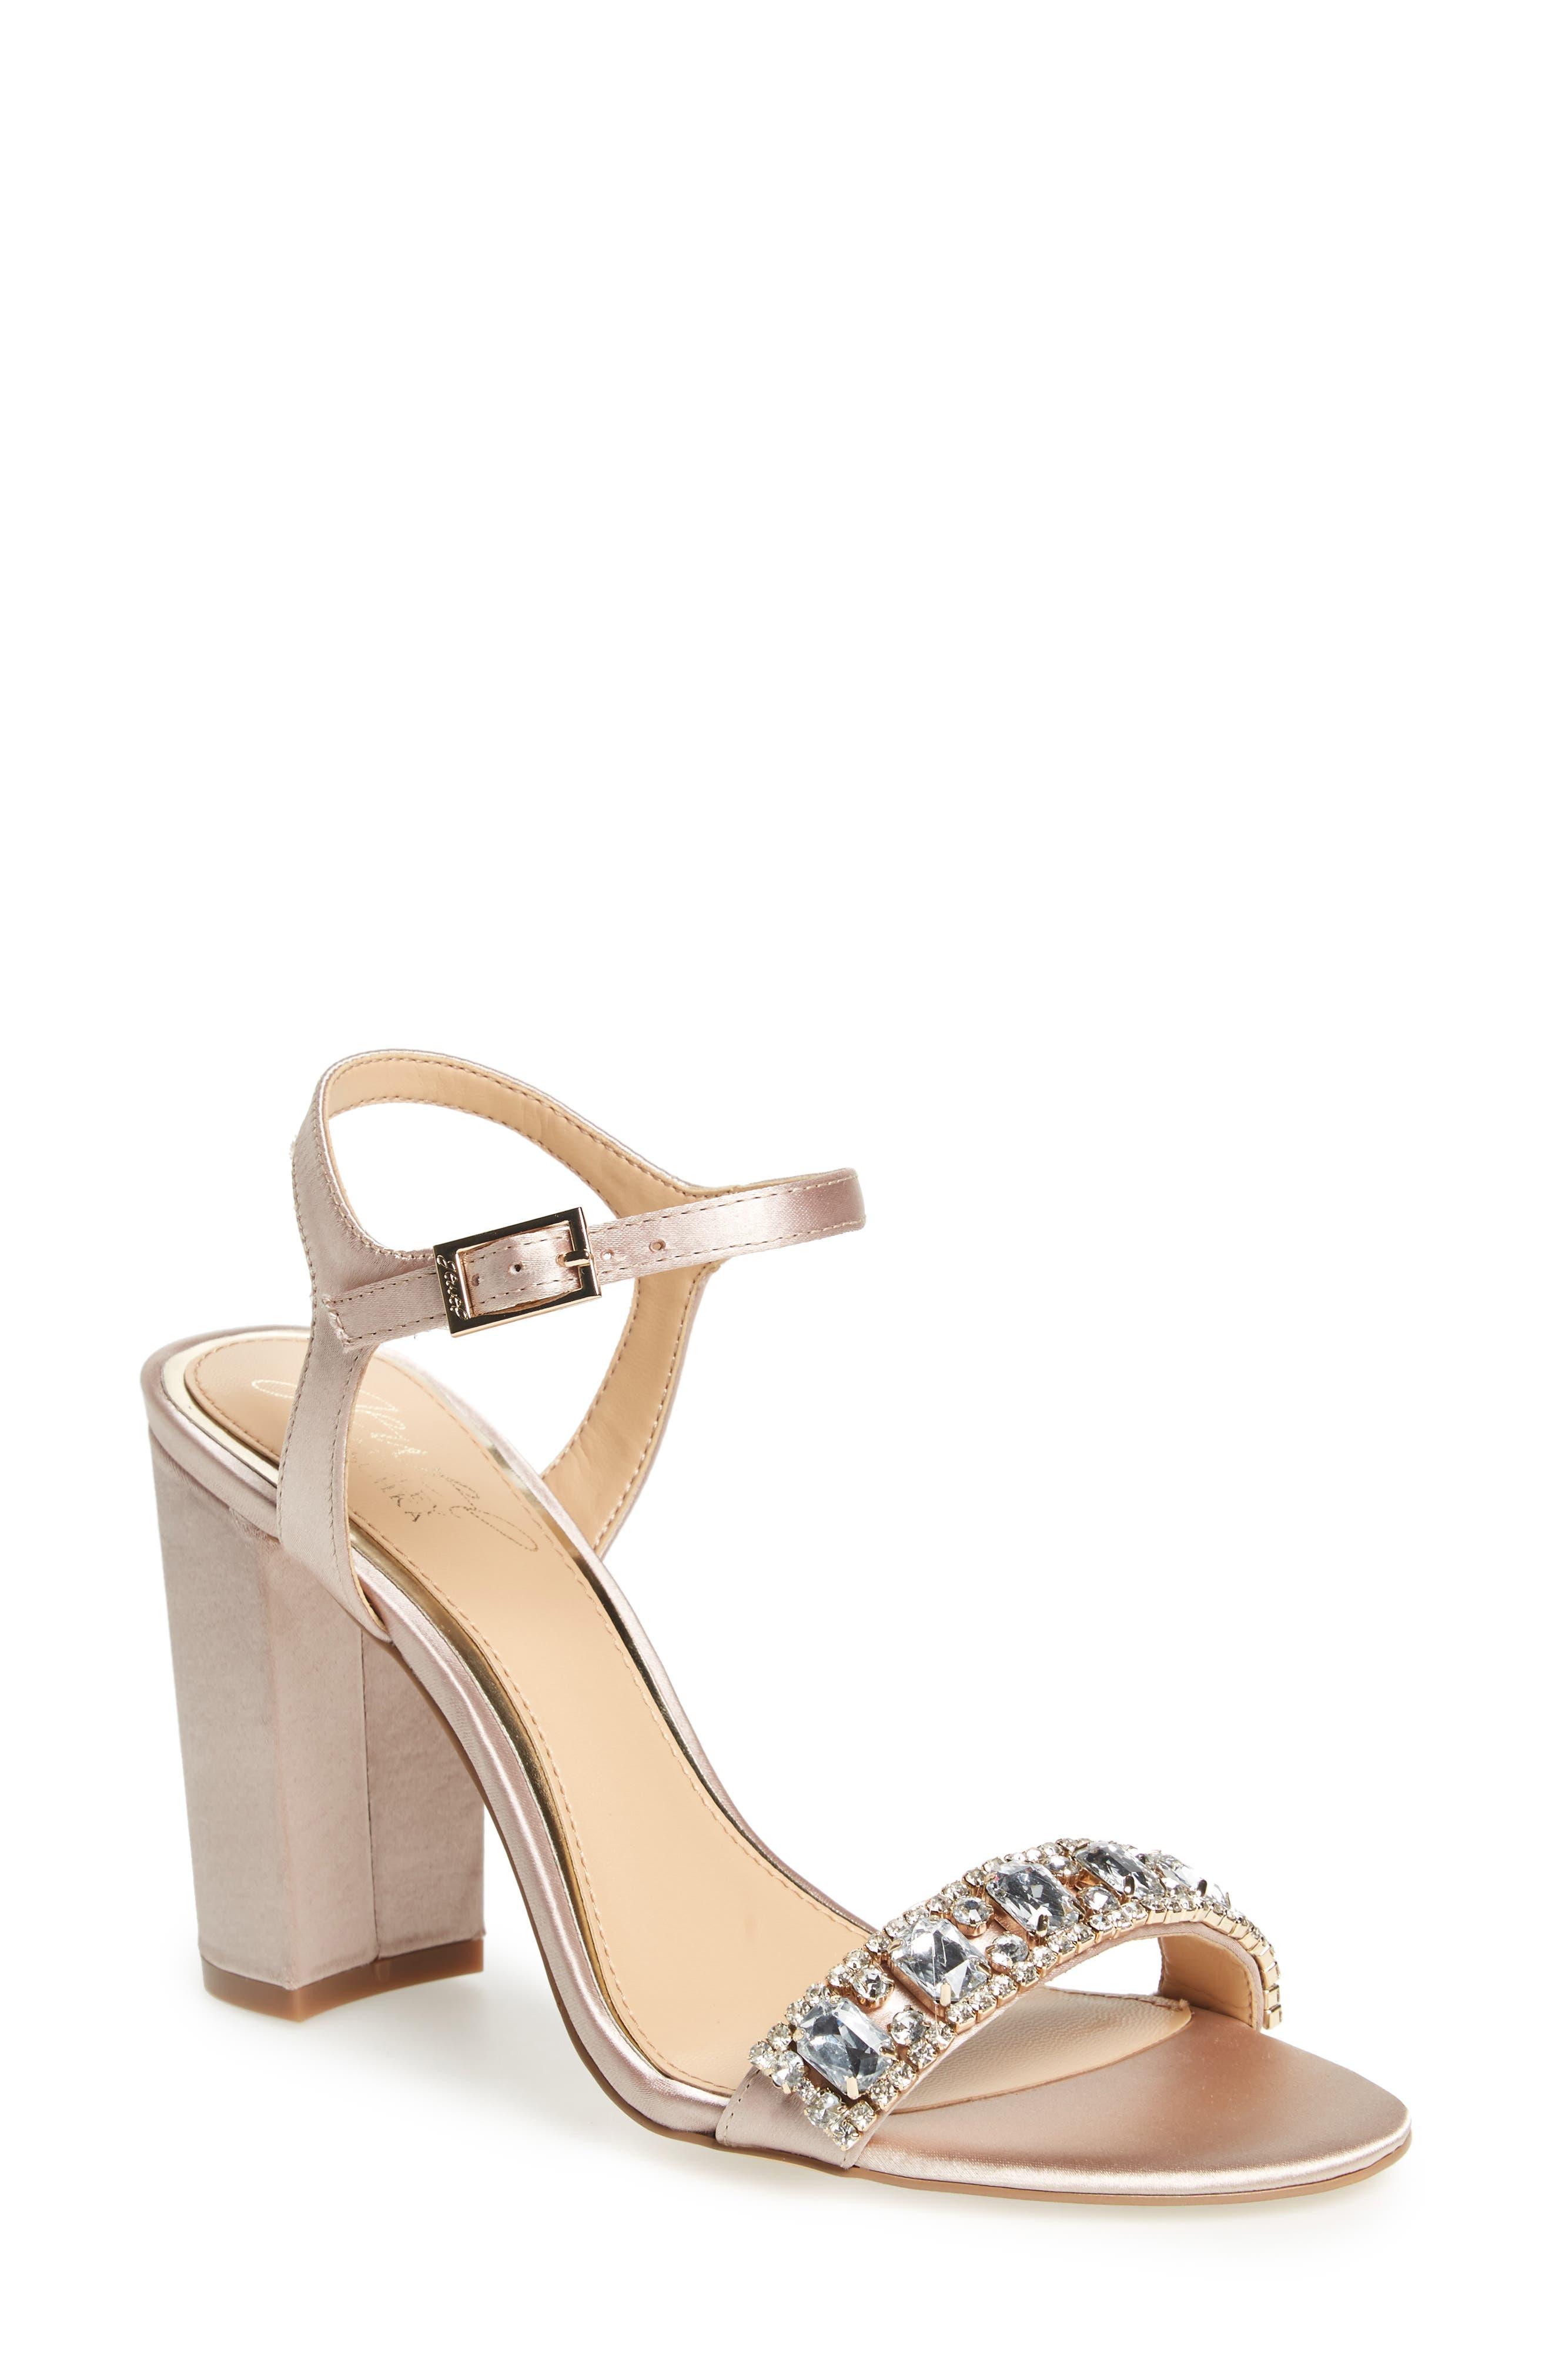 Main Image - Jewel Badgley Mischka Hendricks Embellished Block Heel Sandal (Women)